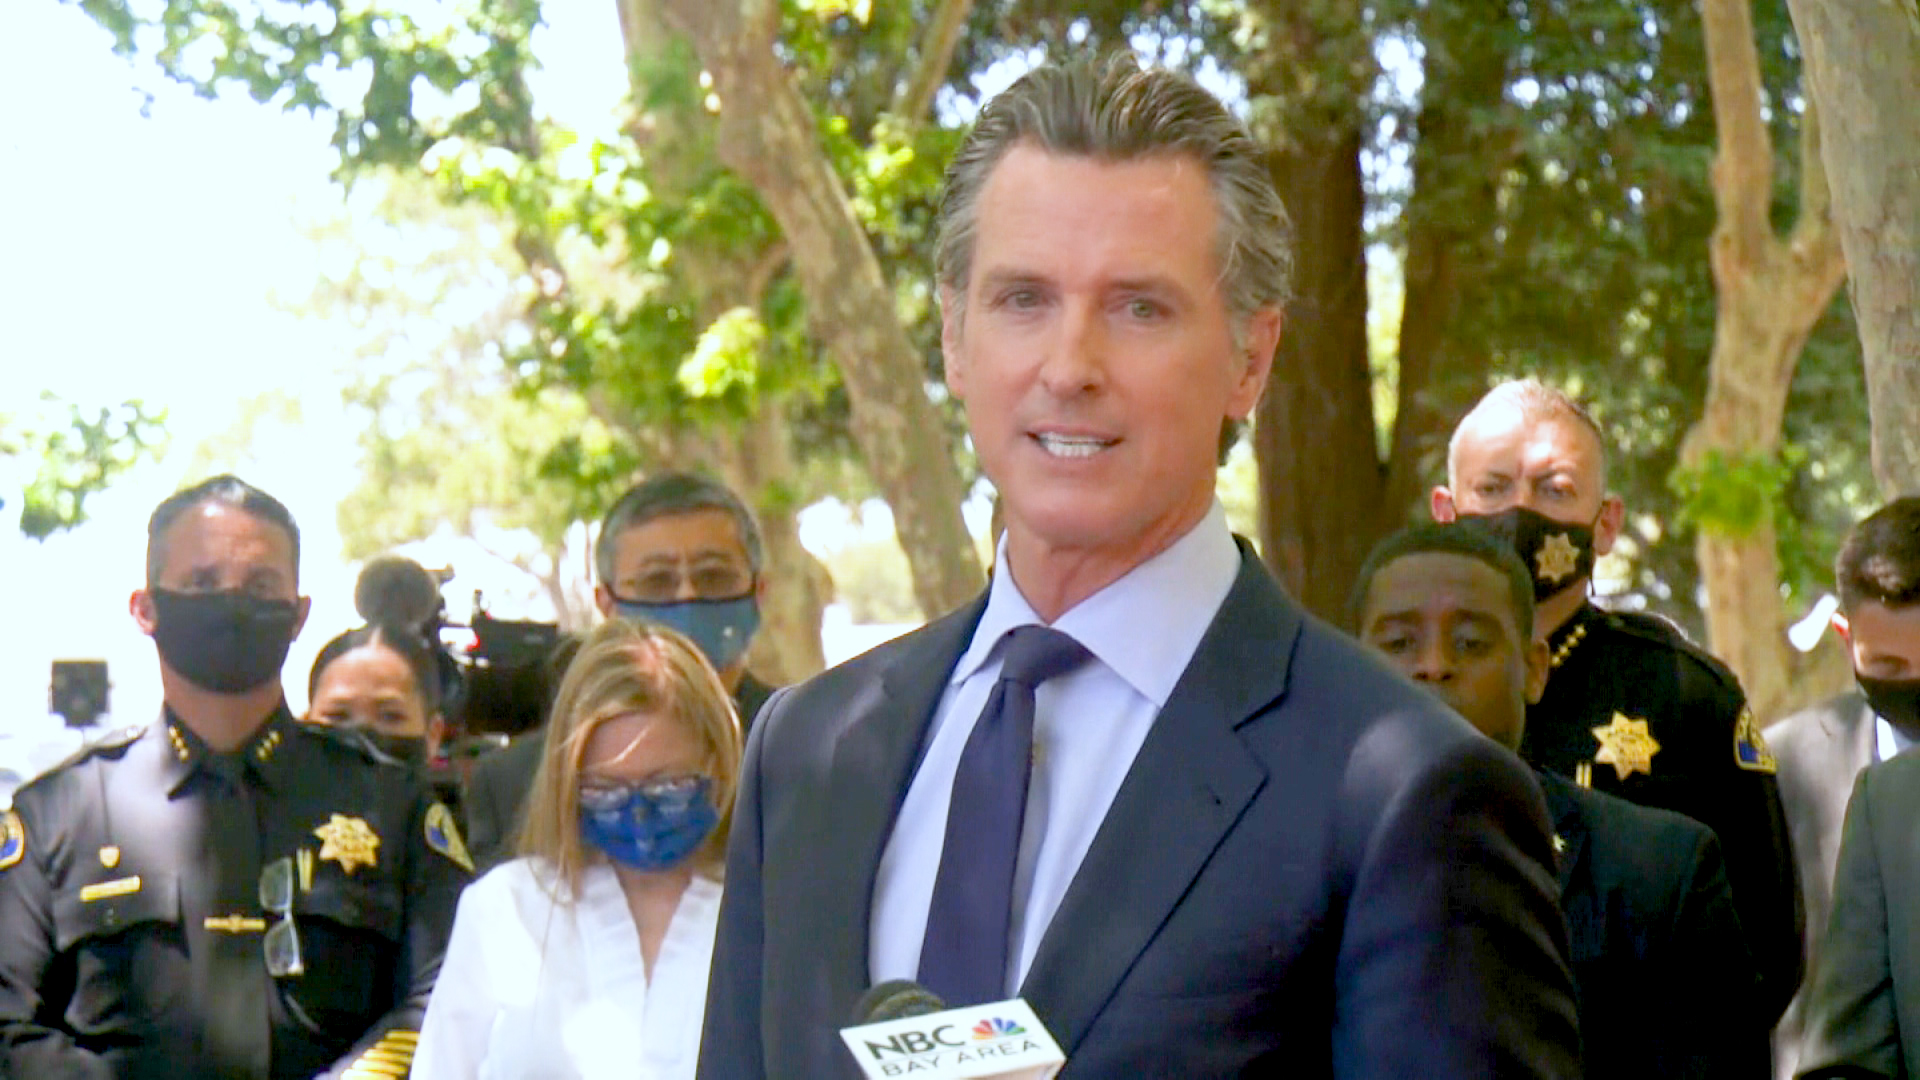 Election to recall California Gov. Gavin Newsom set for September 14